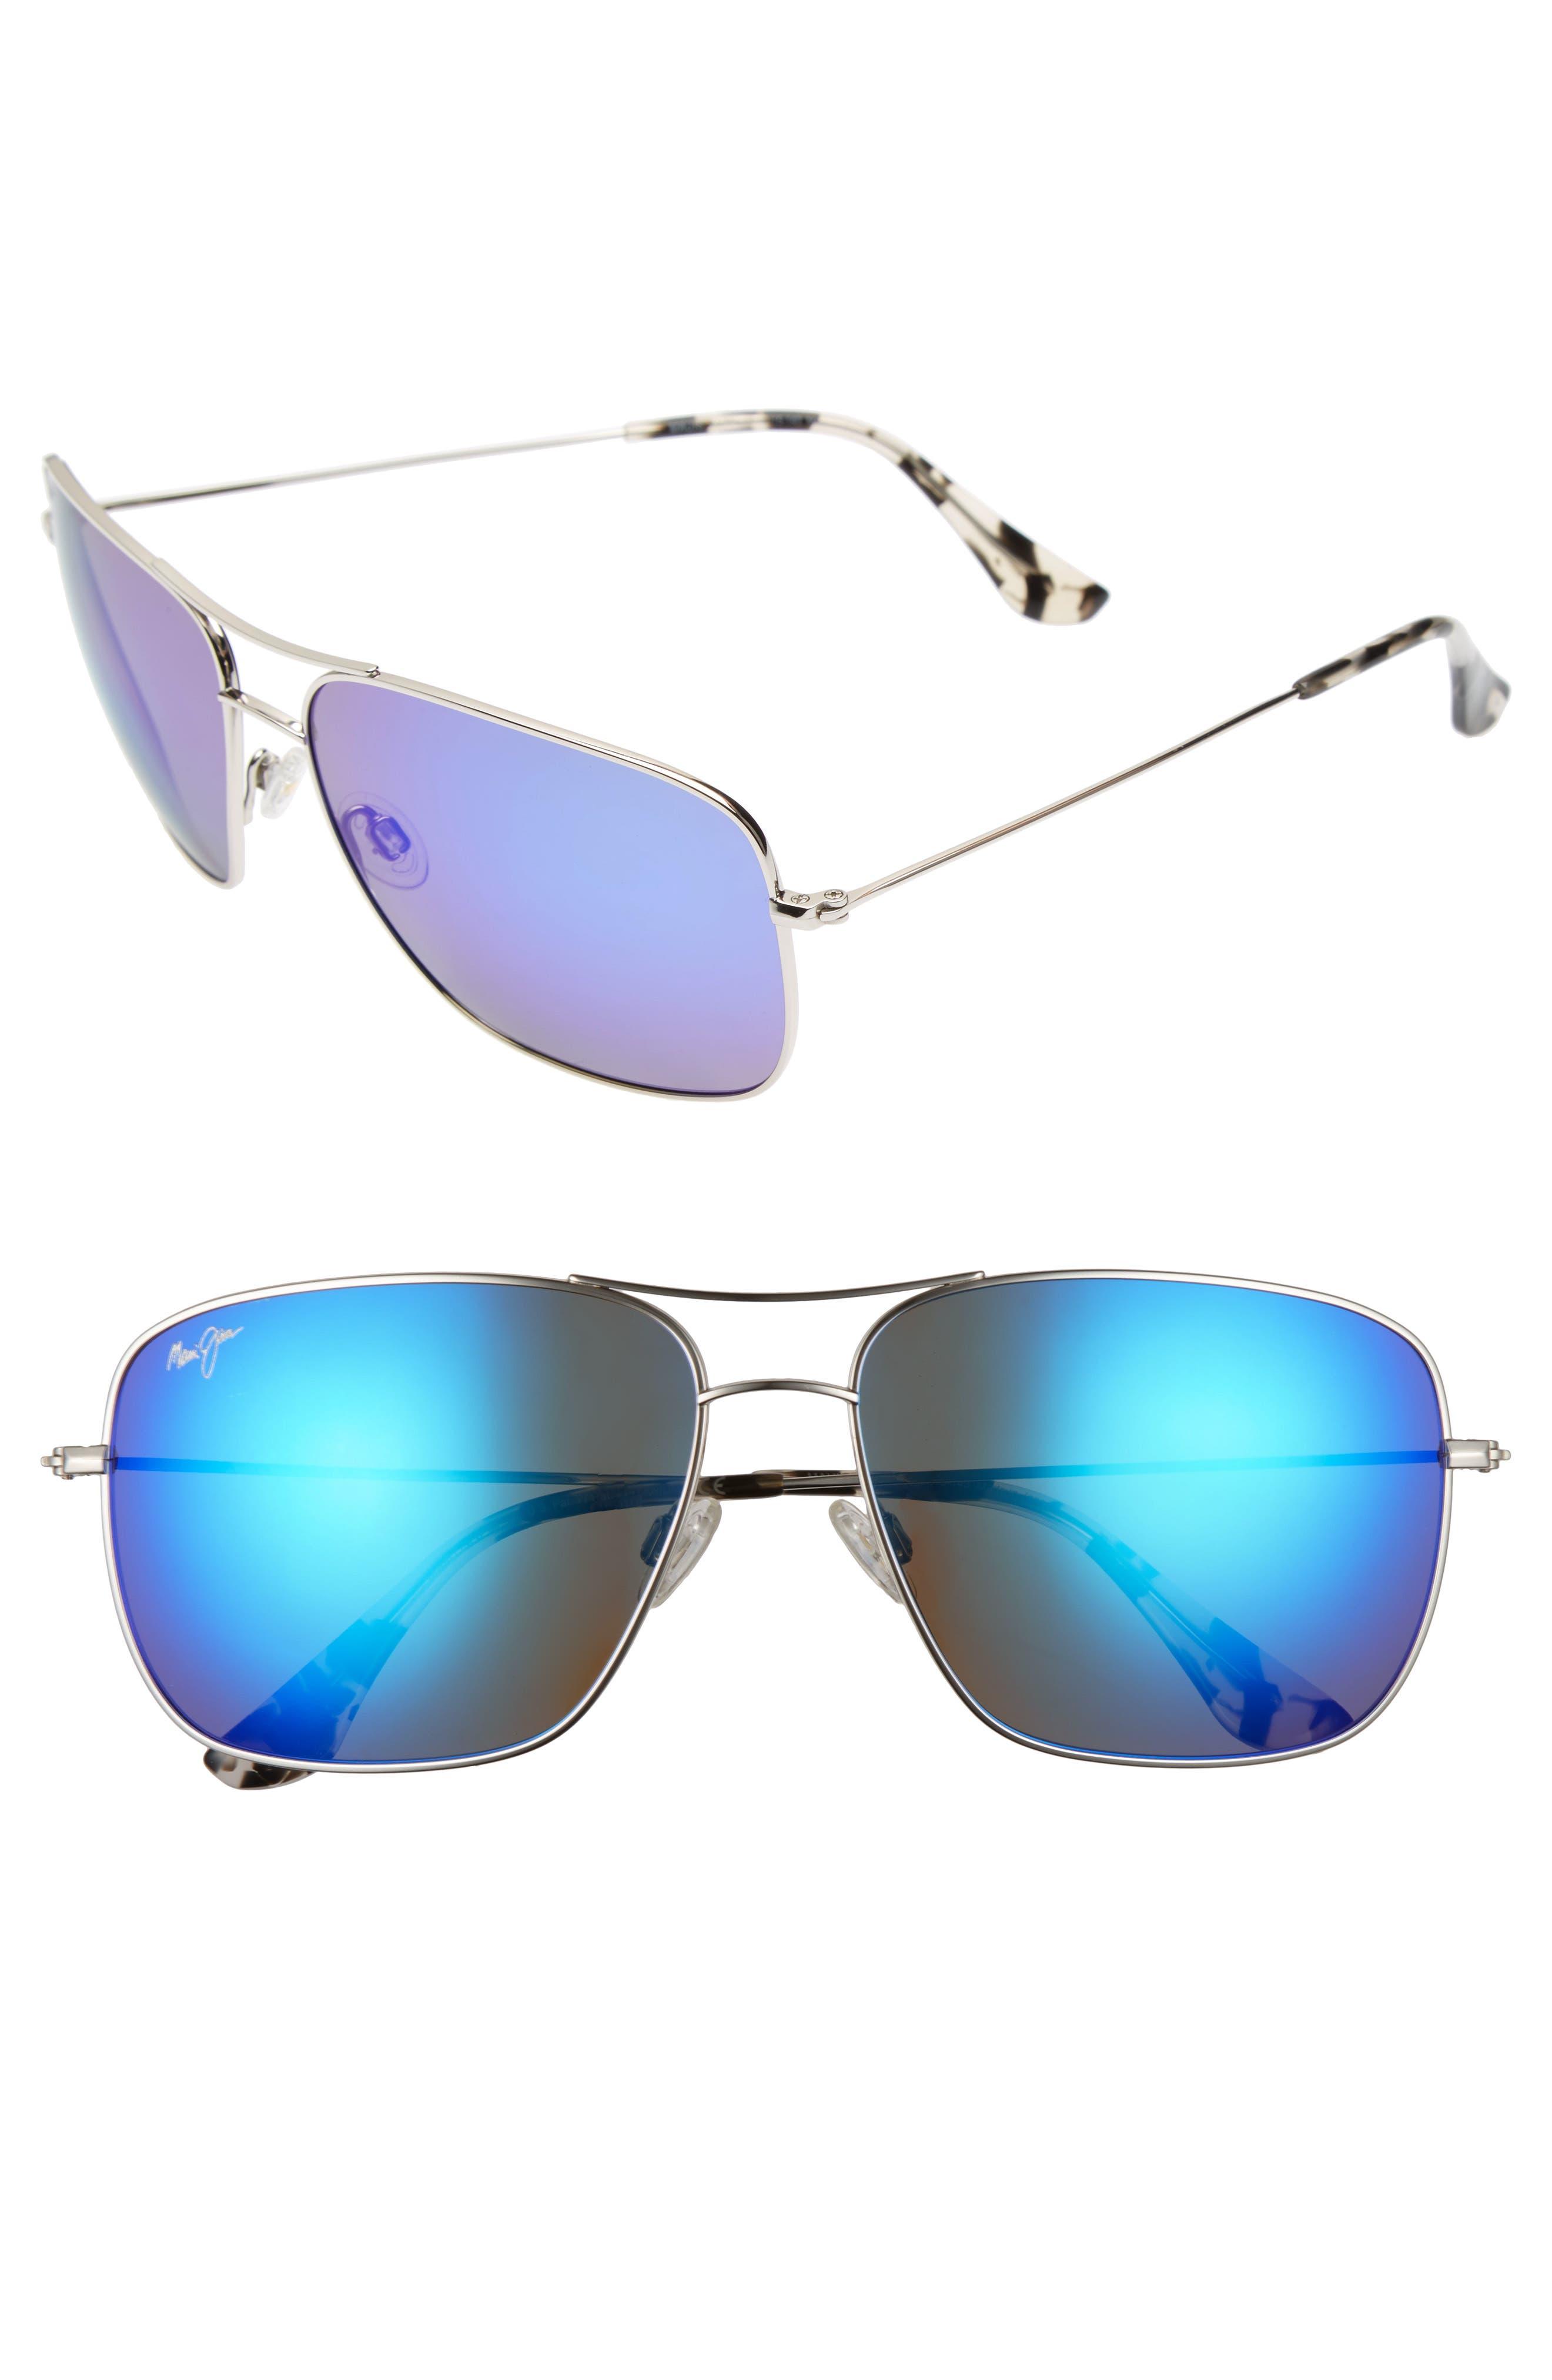 Maui Jim Cook Pines 63mm Polarized Titanium Aviator Sunglasses